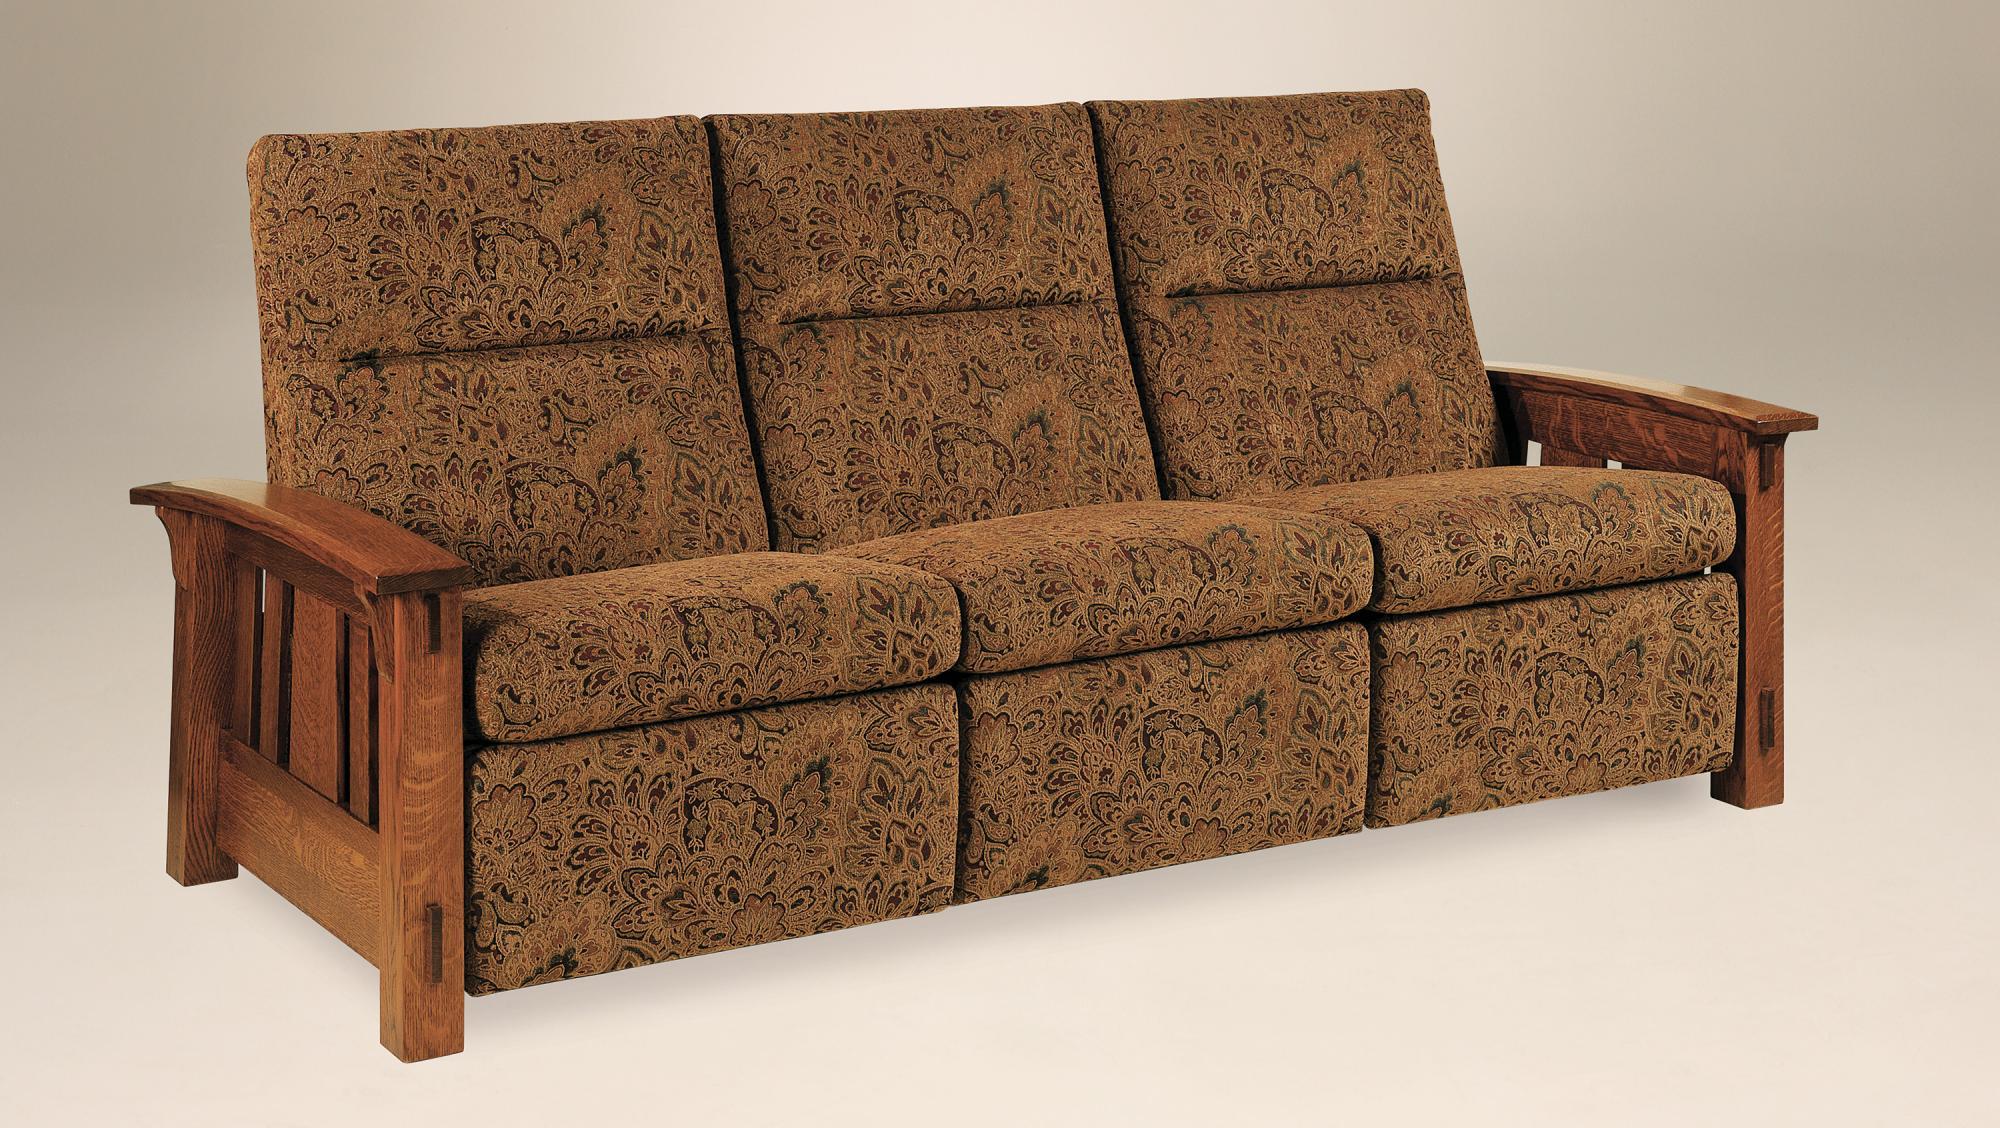 Mccoy Wall Hugger Amish Furniture Store Mankato Mn